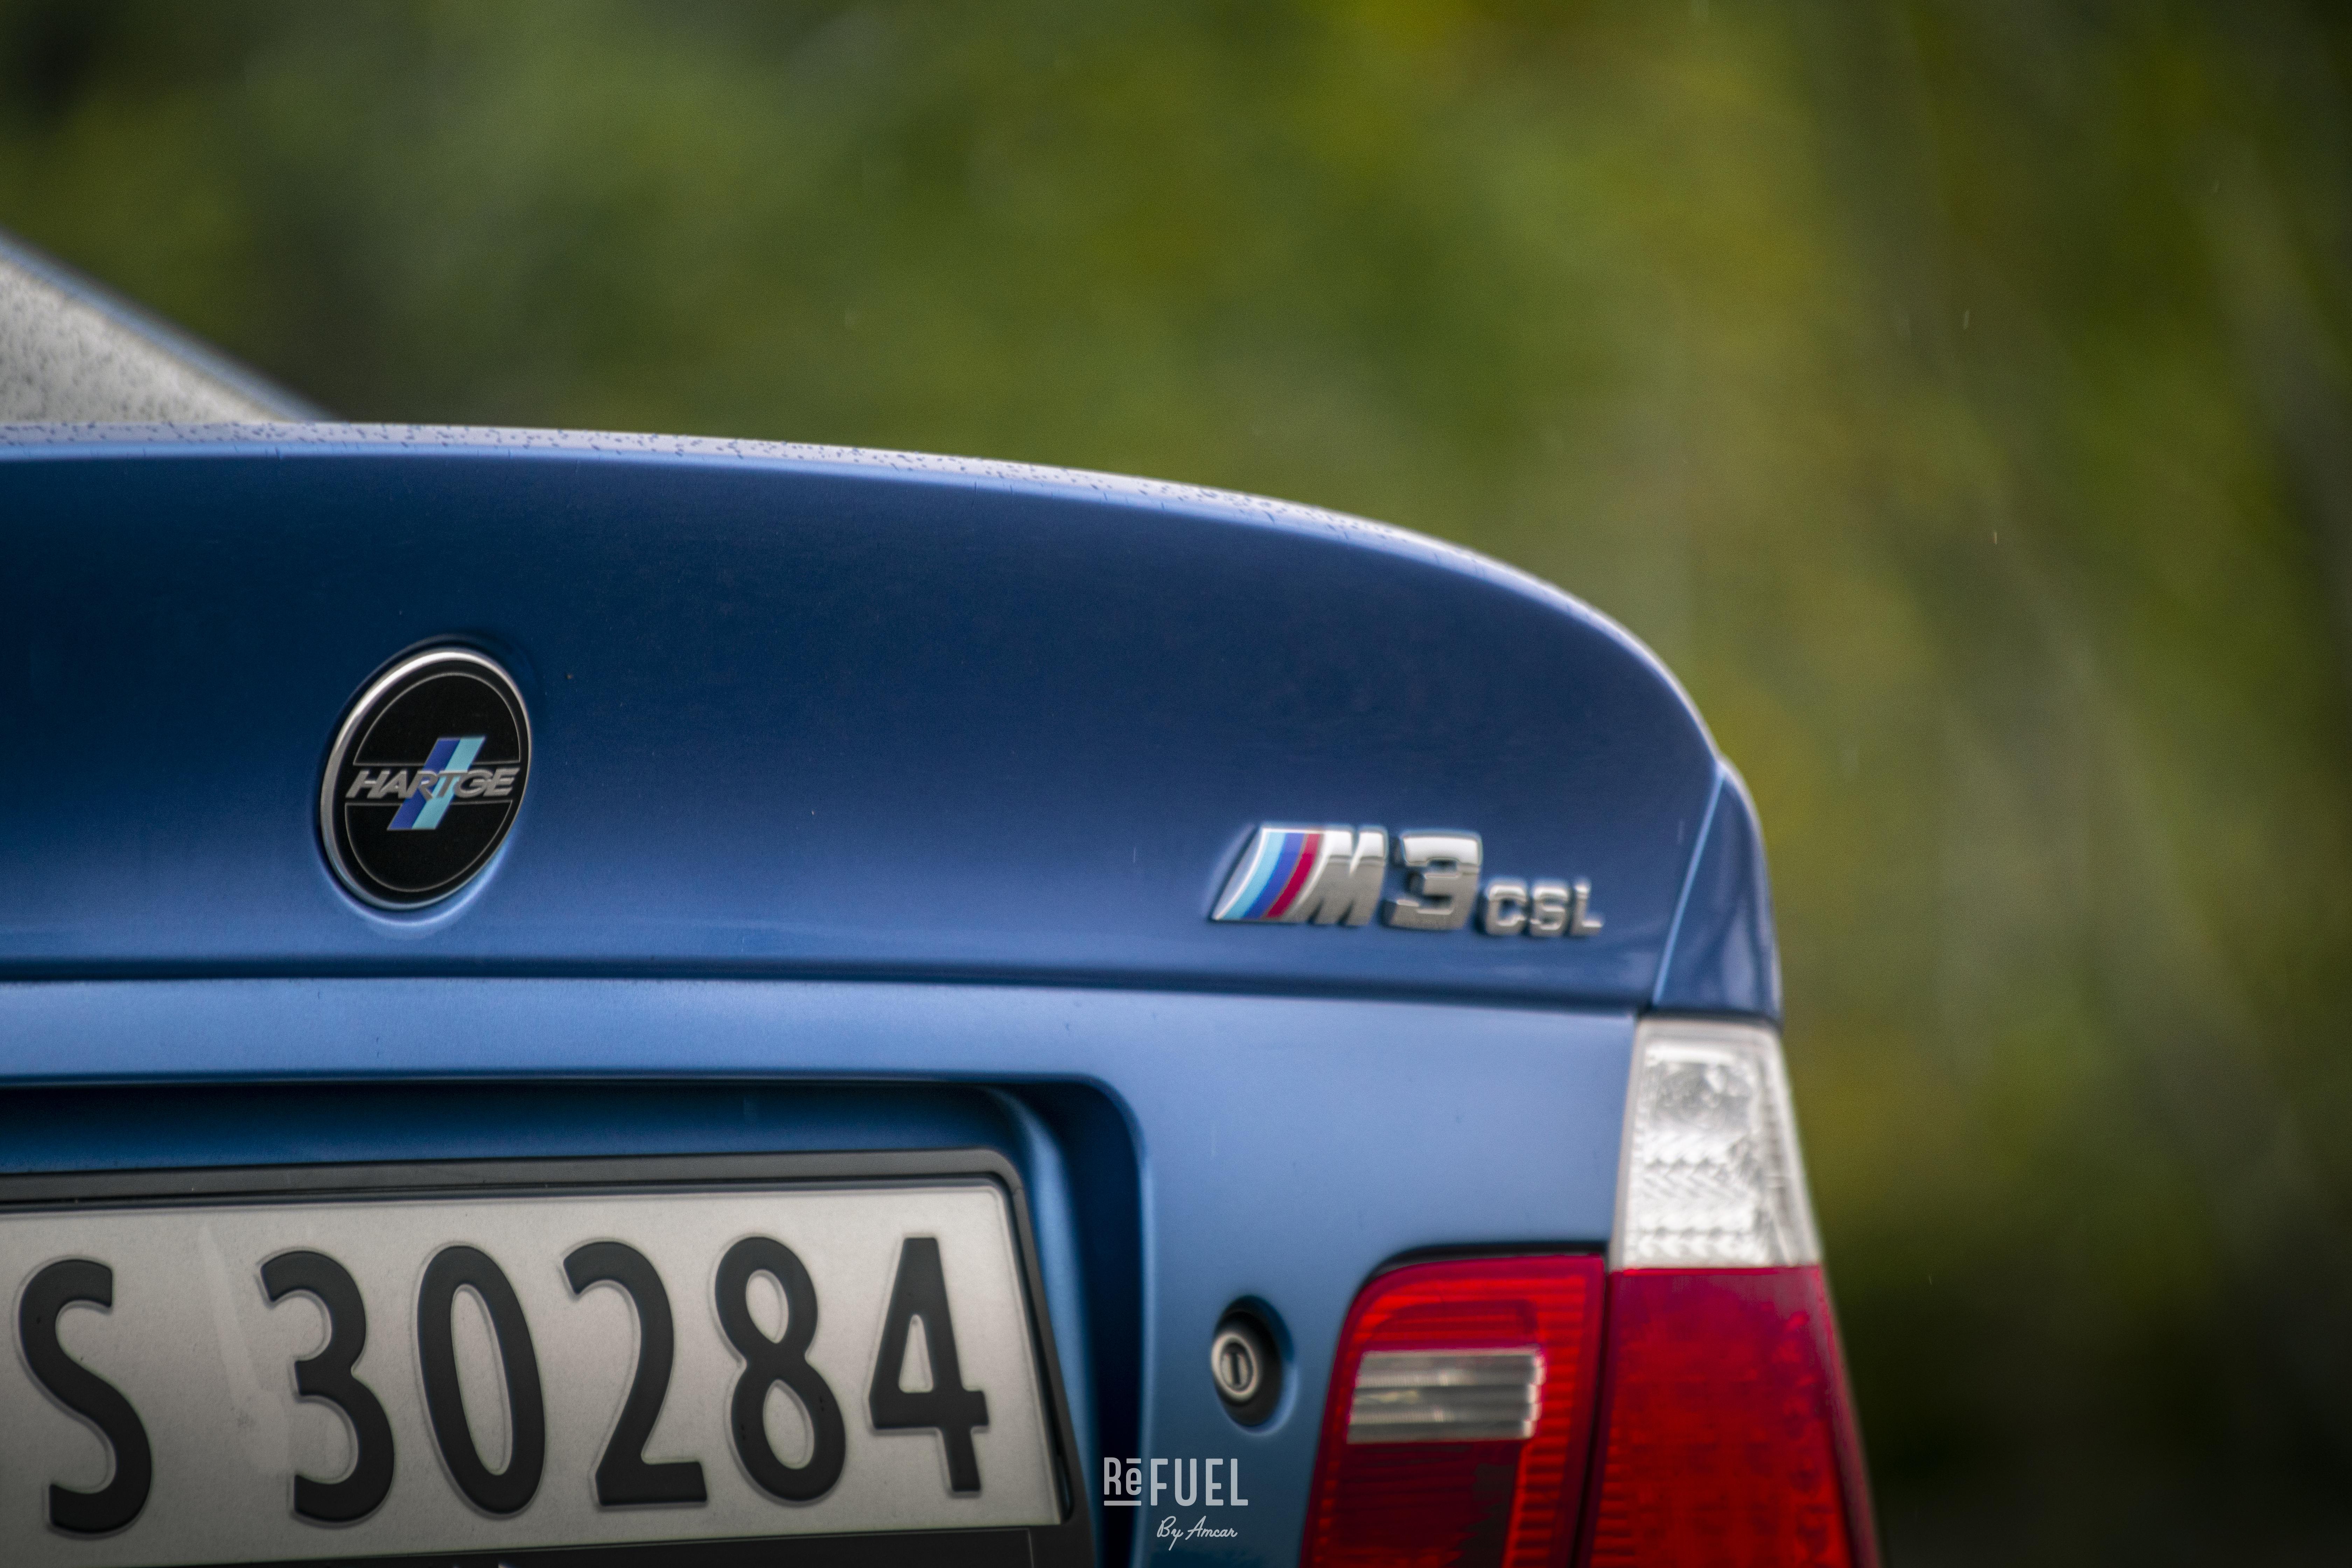 Den helt spesielle emblem-komboen Hartge M3 CSL pryder bakenden.